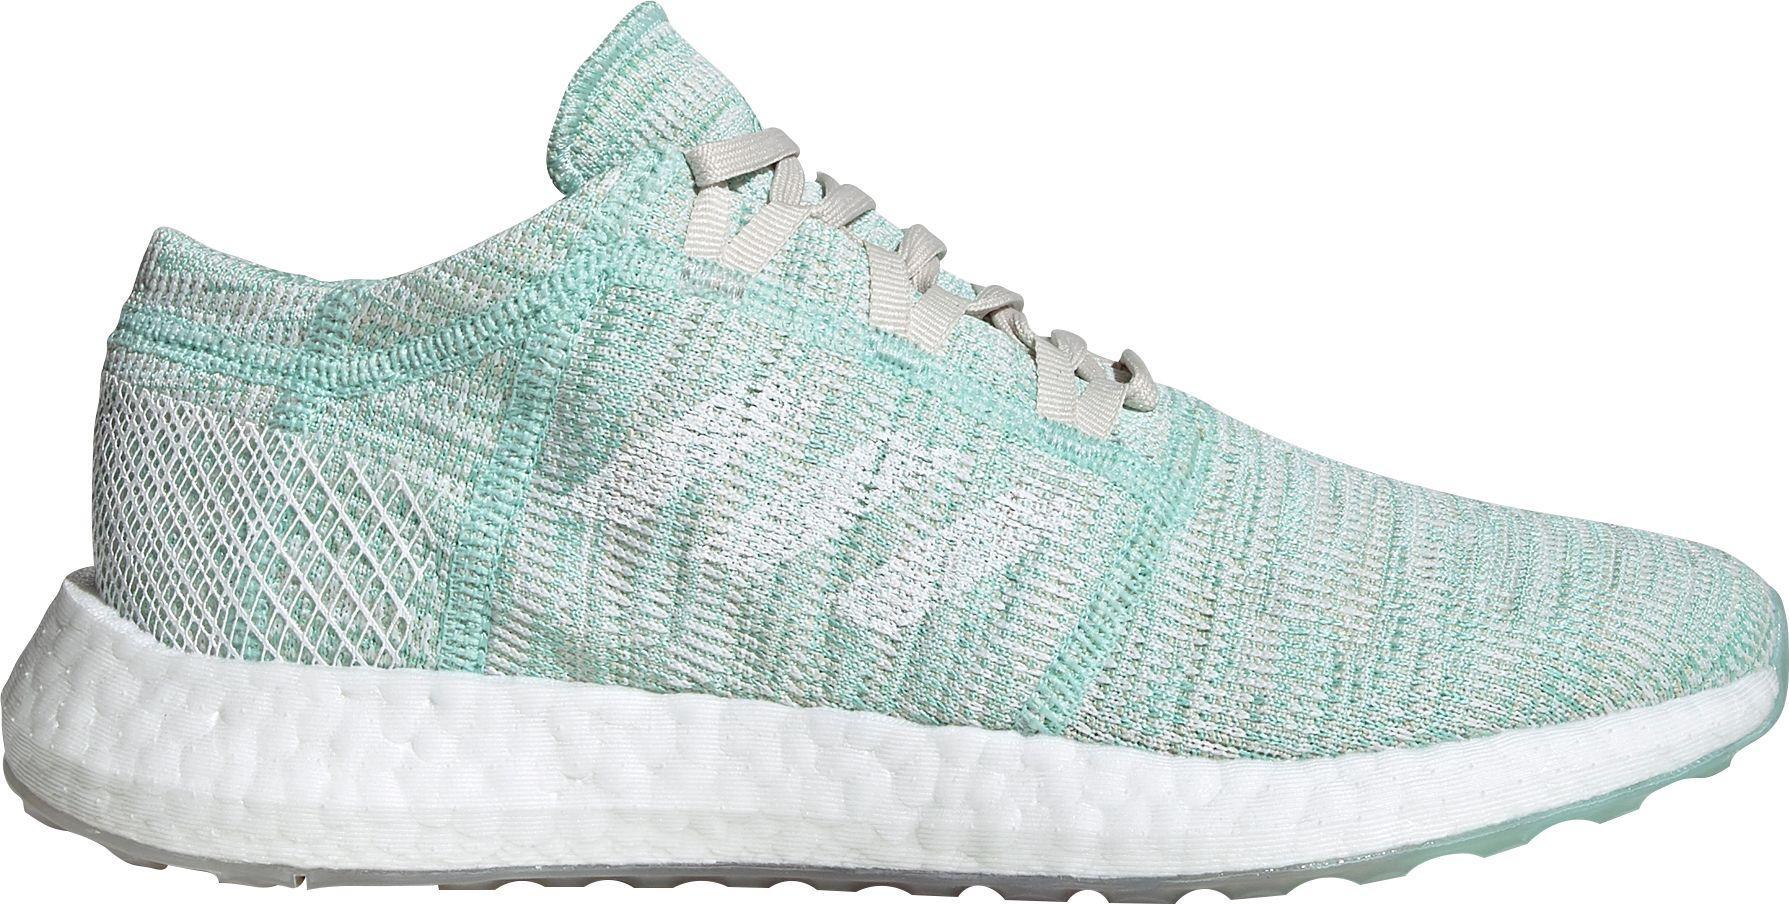 c6ec4f189 Adidas - Multicolor Pureboost Go Running Shoes - Lyst